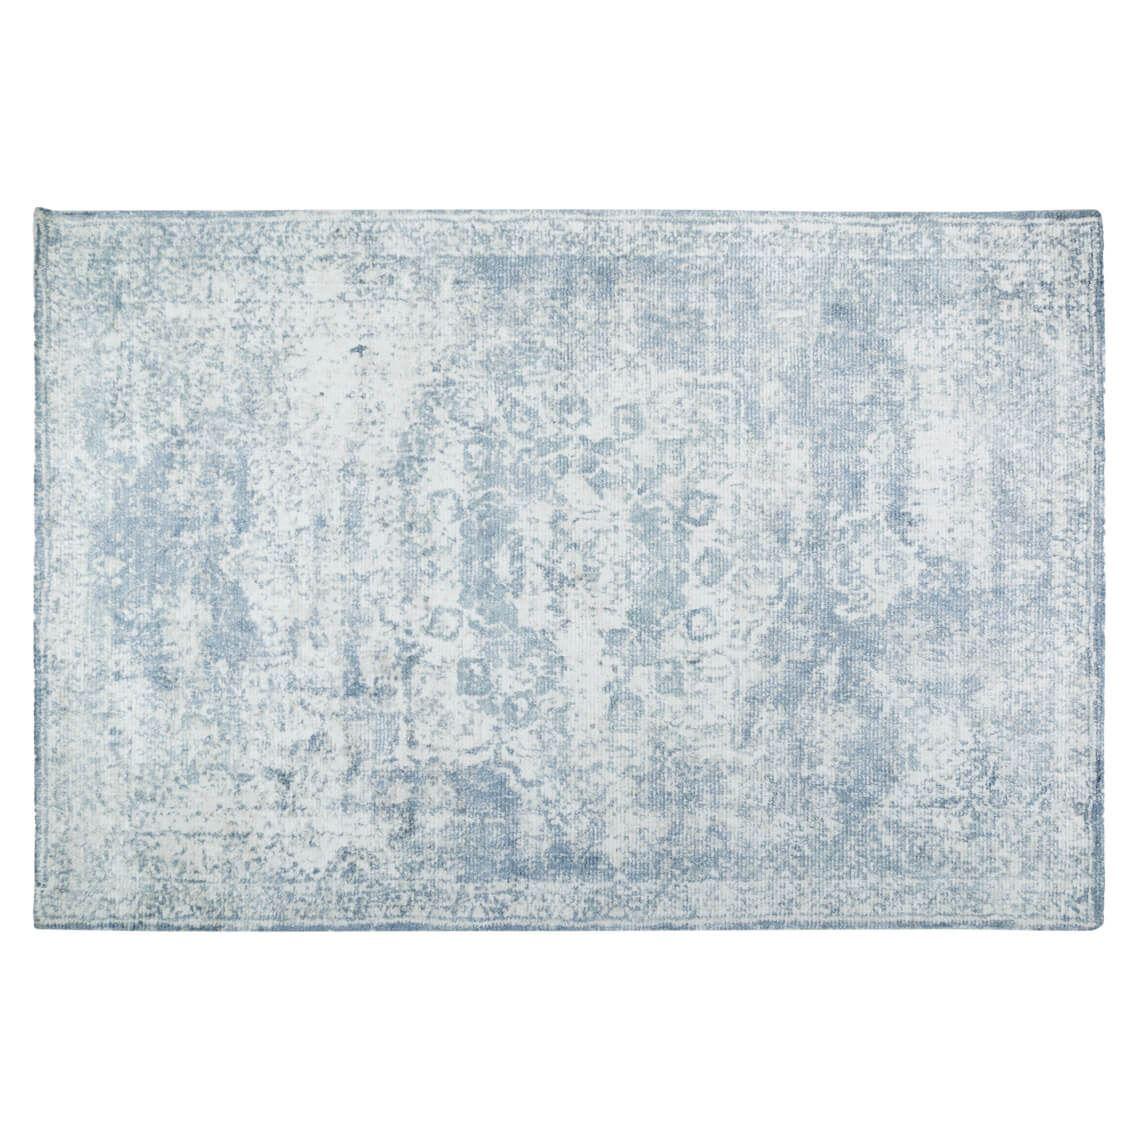 Naida Floor Rug Size W 200cm x D 300cm x H 1cm in Grey Wool/Viscose Freedom